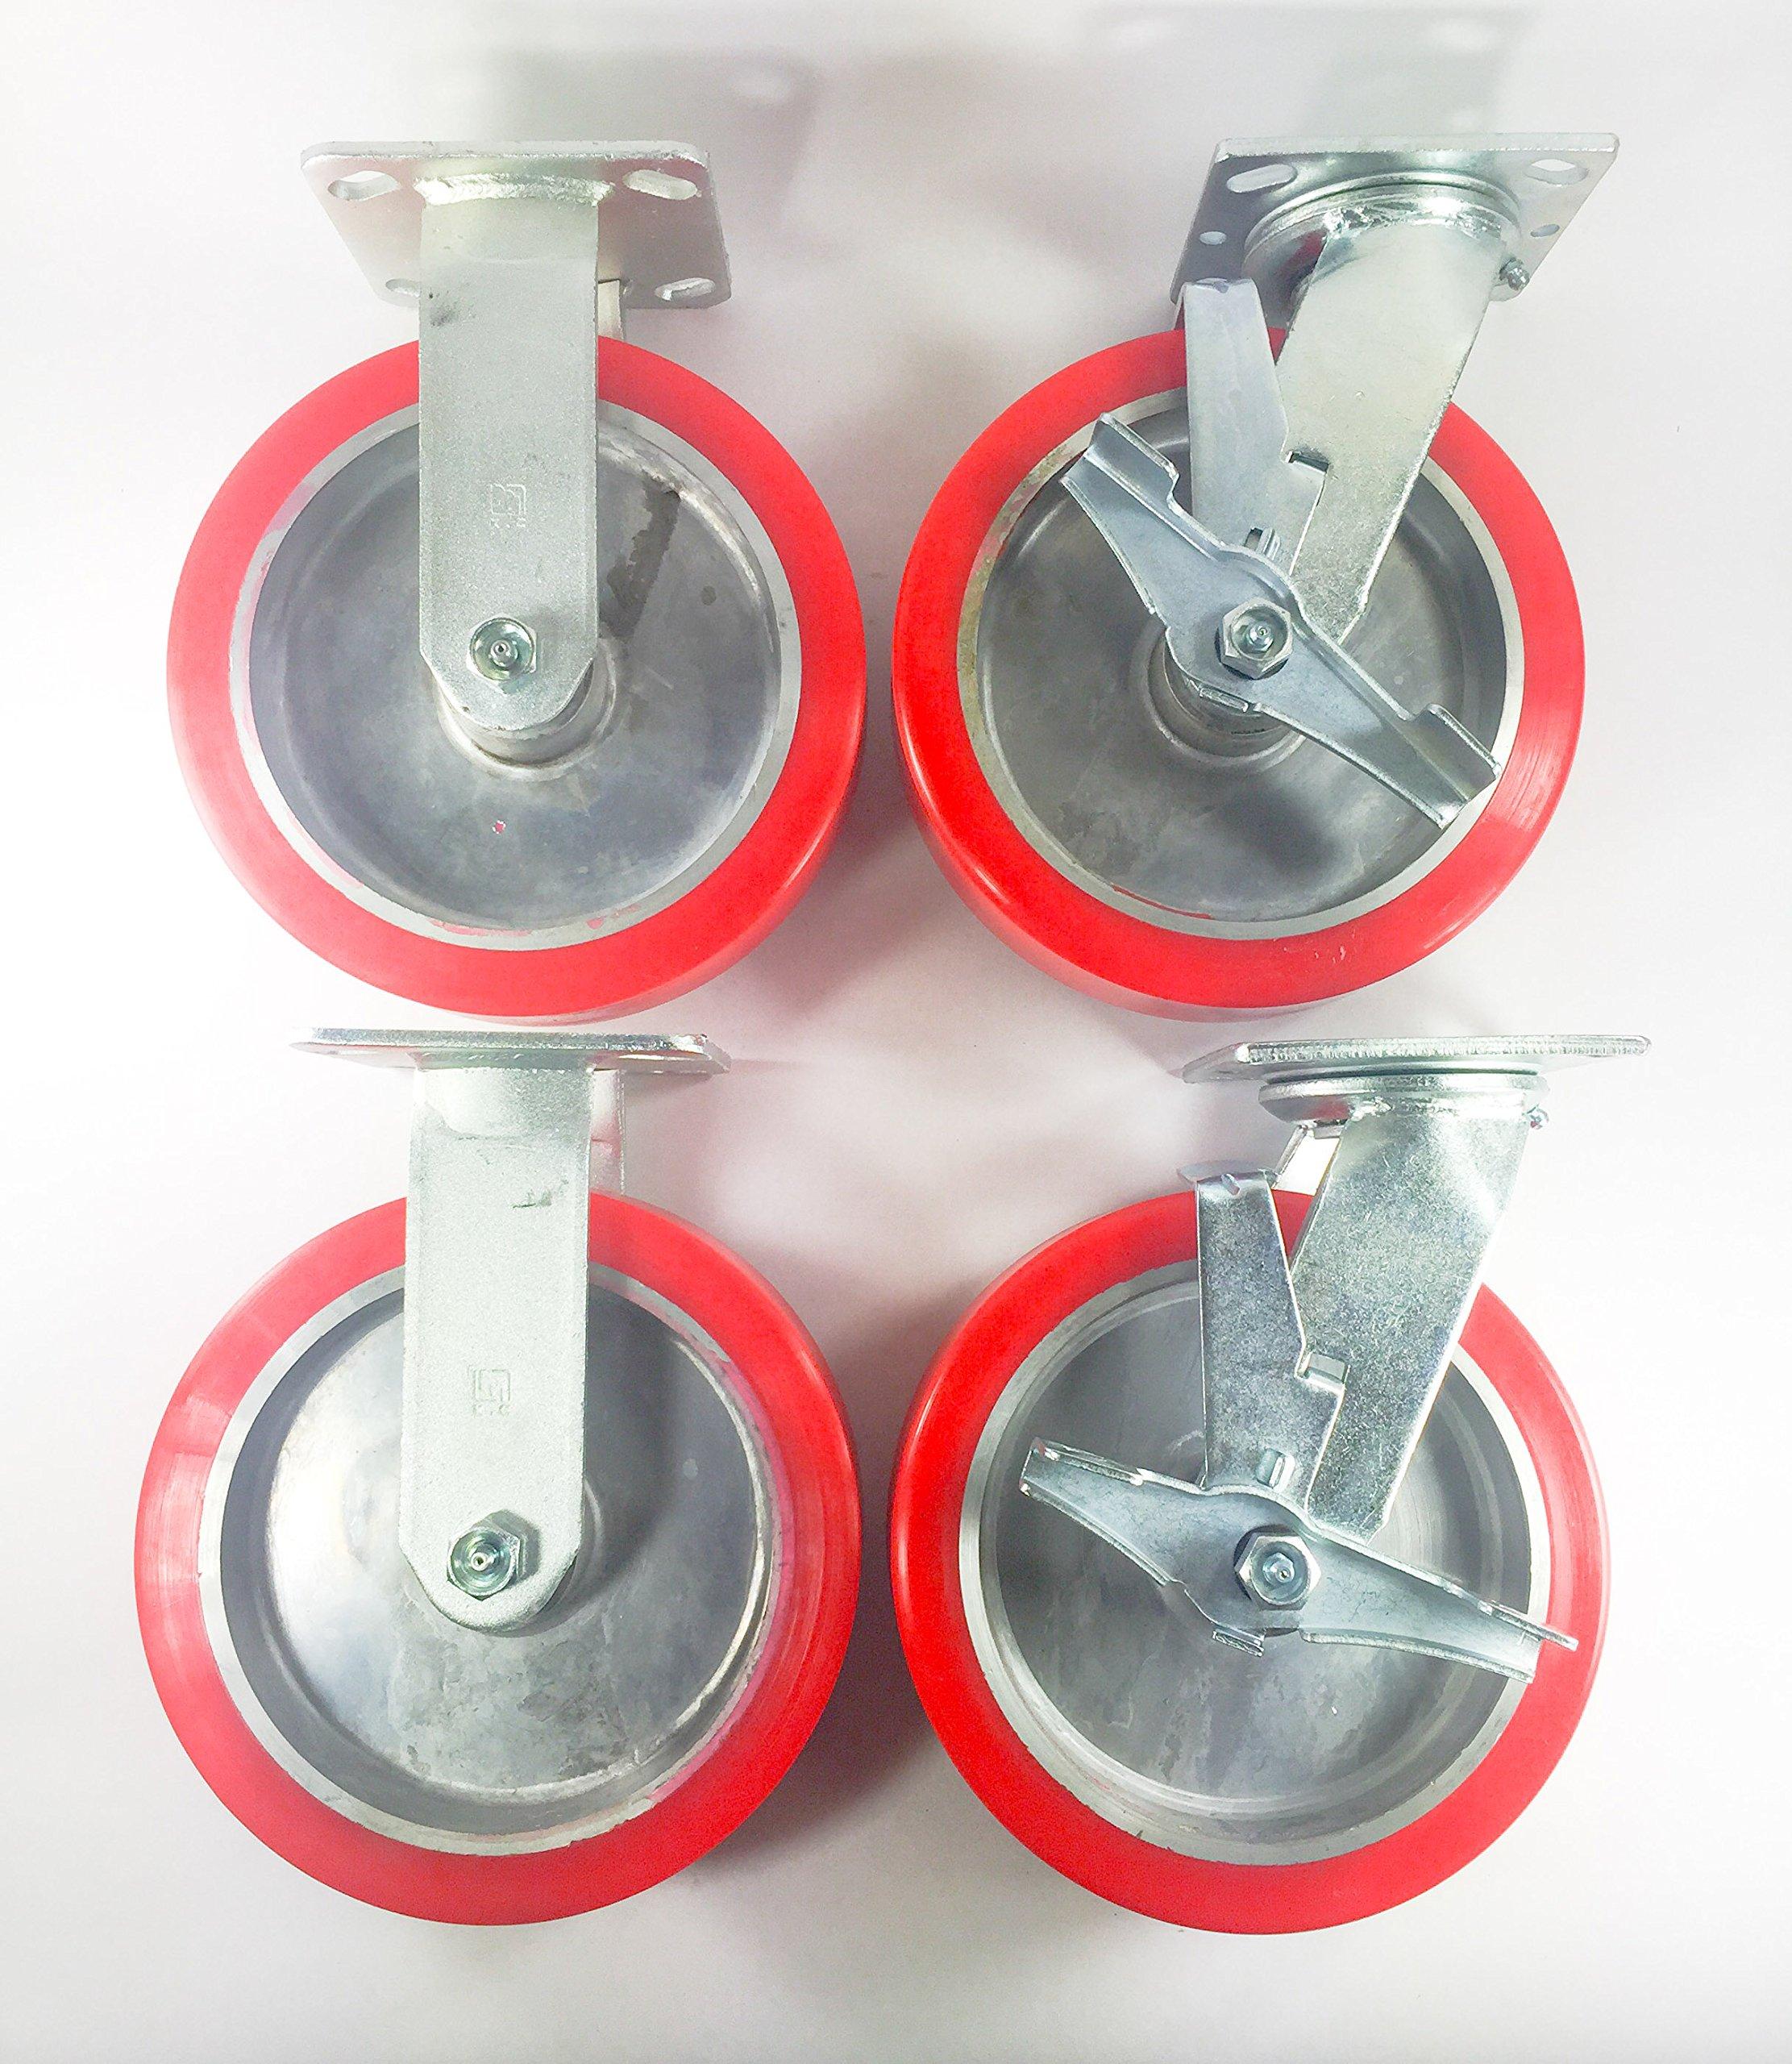 8'' X 2'' Polyurethane on Aluminum Caster - Rigid (2ea) & Swivel with Brake (2ea)